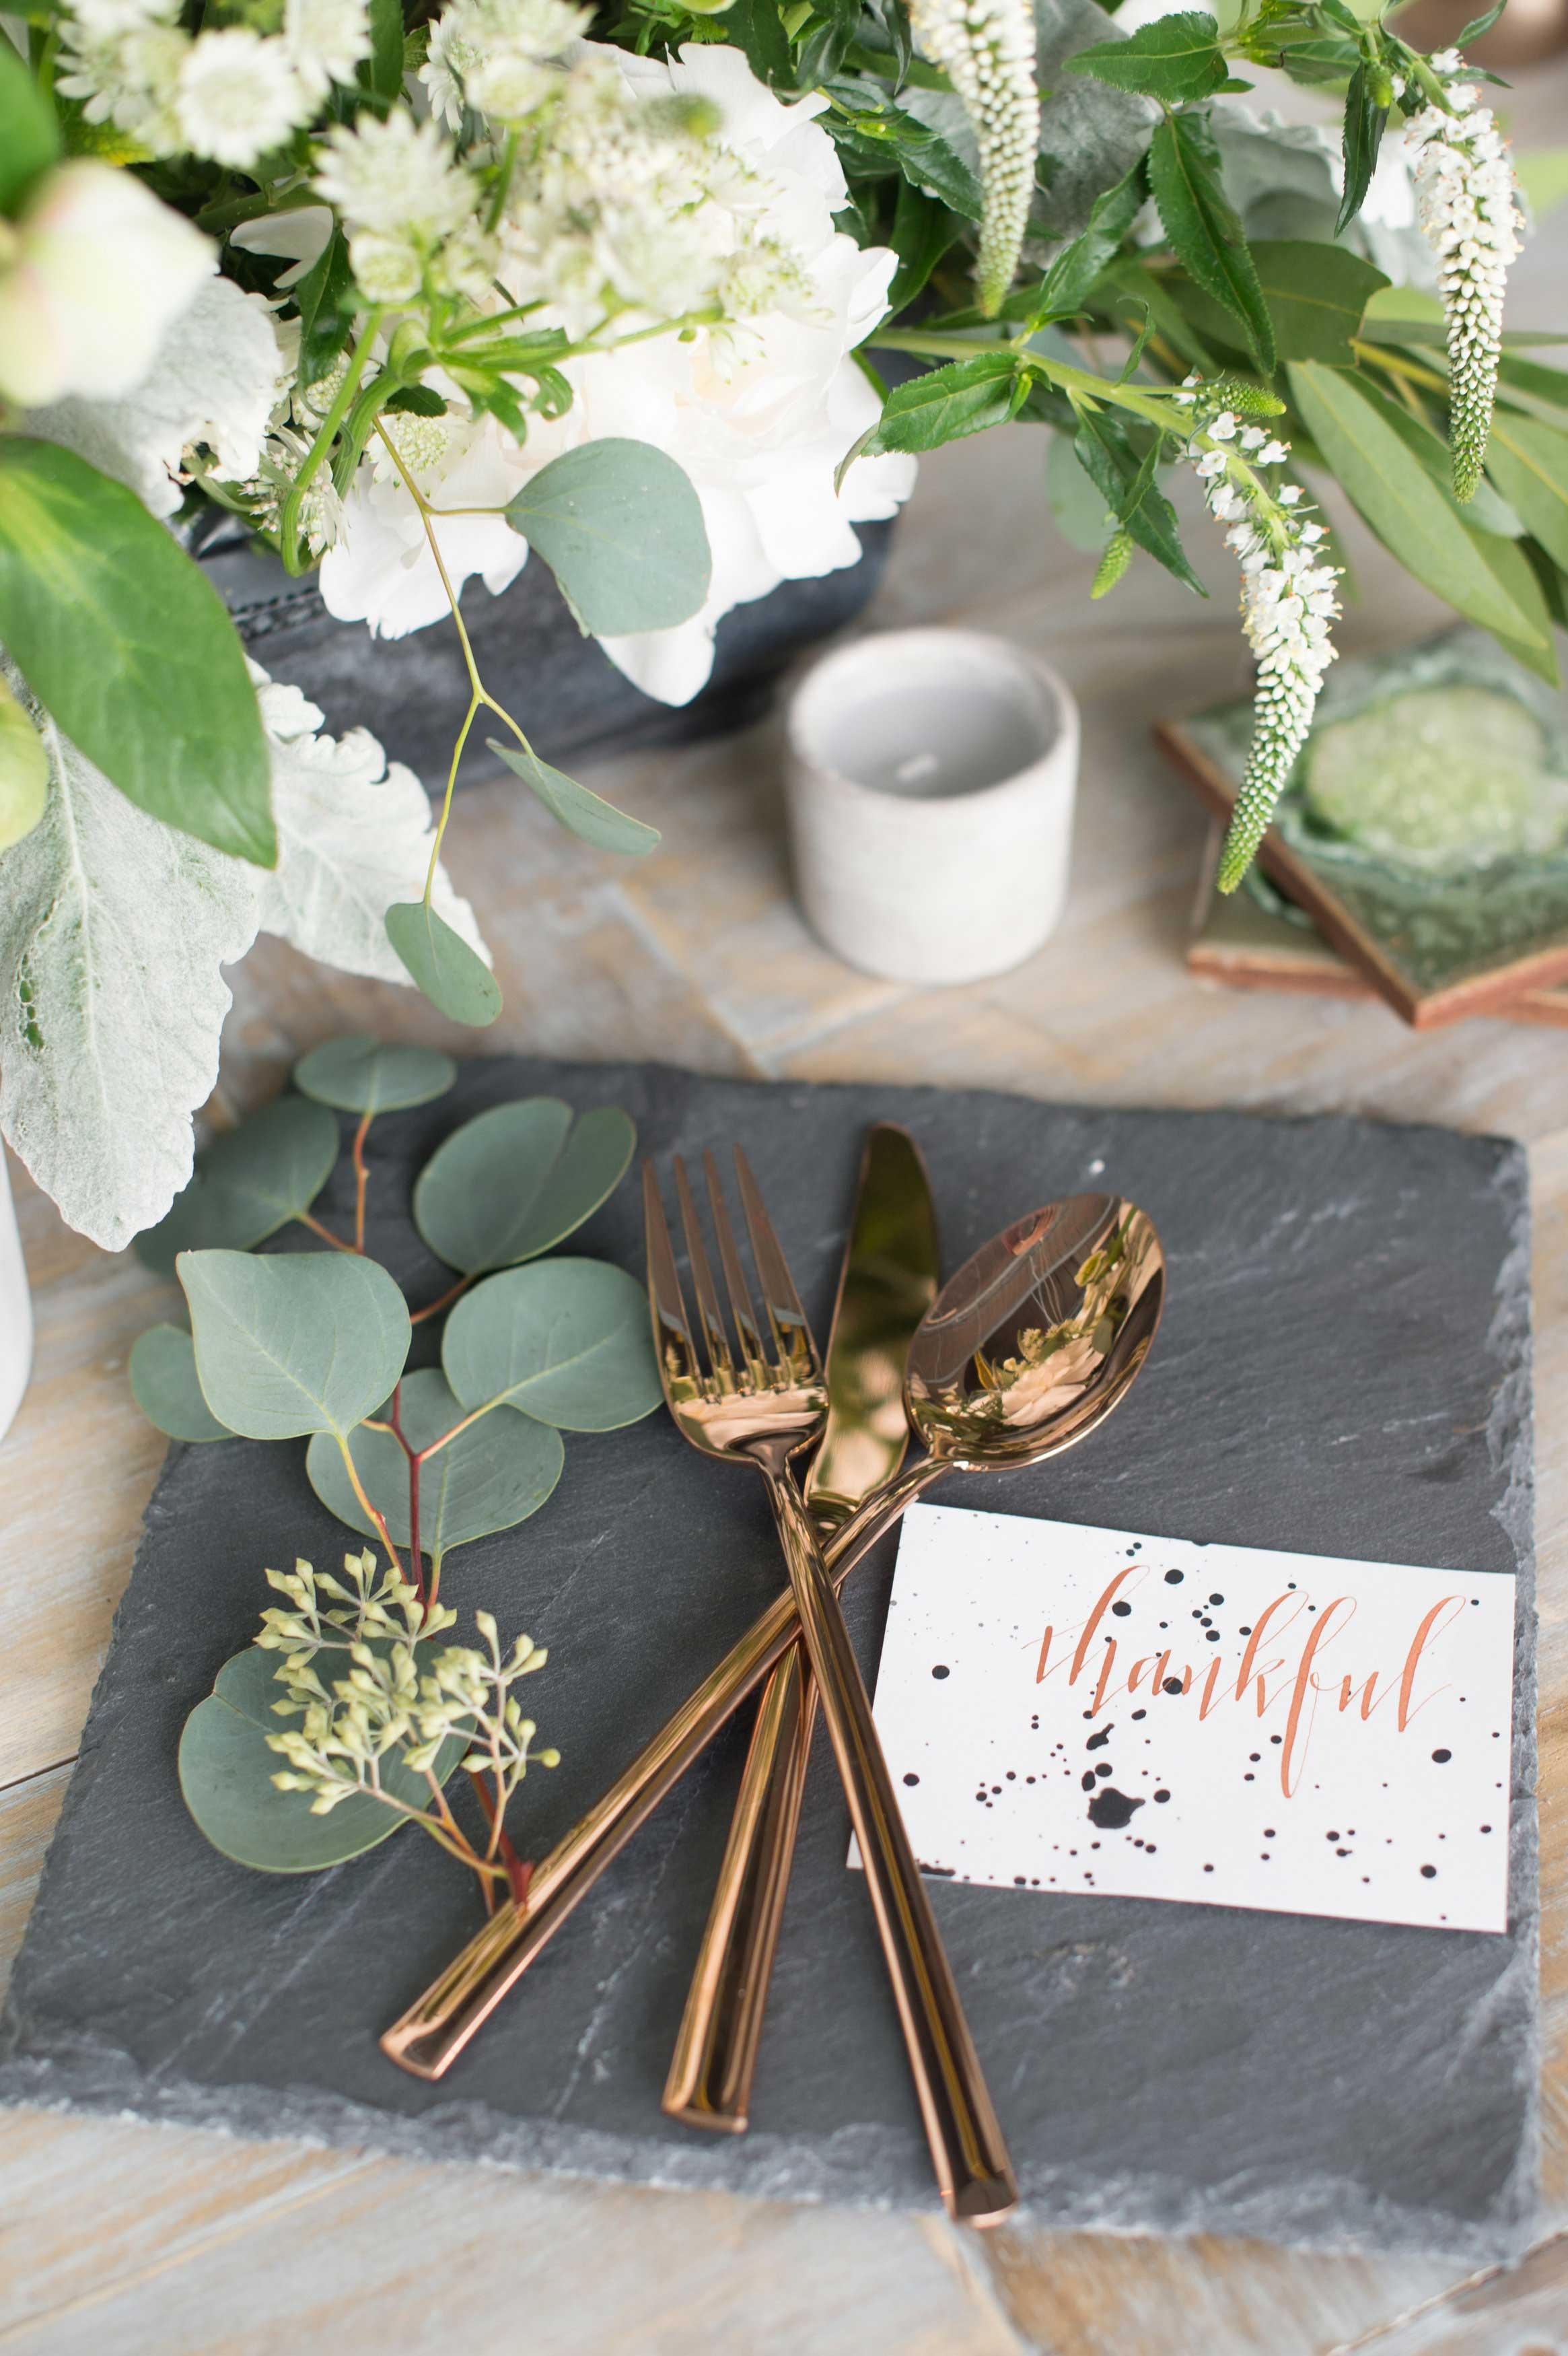 EVOKE DC Modern Whimsy wedding ideas slate stand with rose gold flatware fork knife spoon